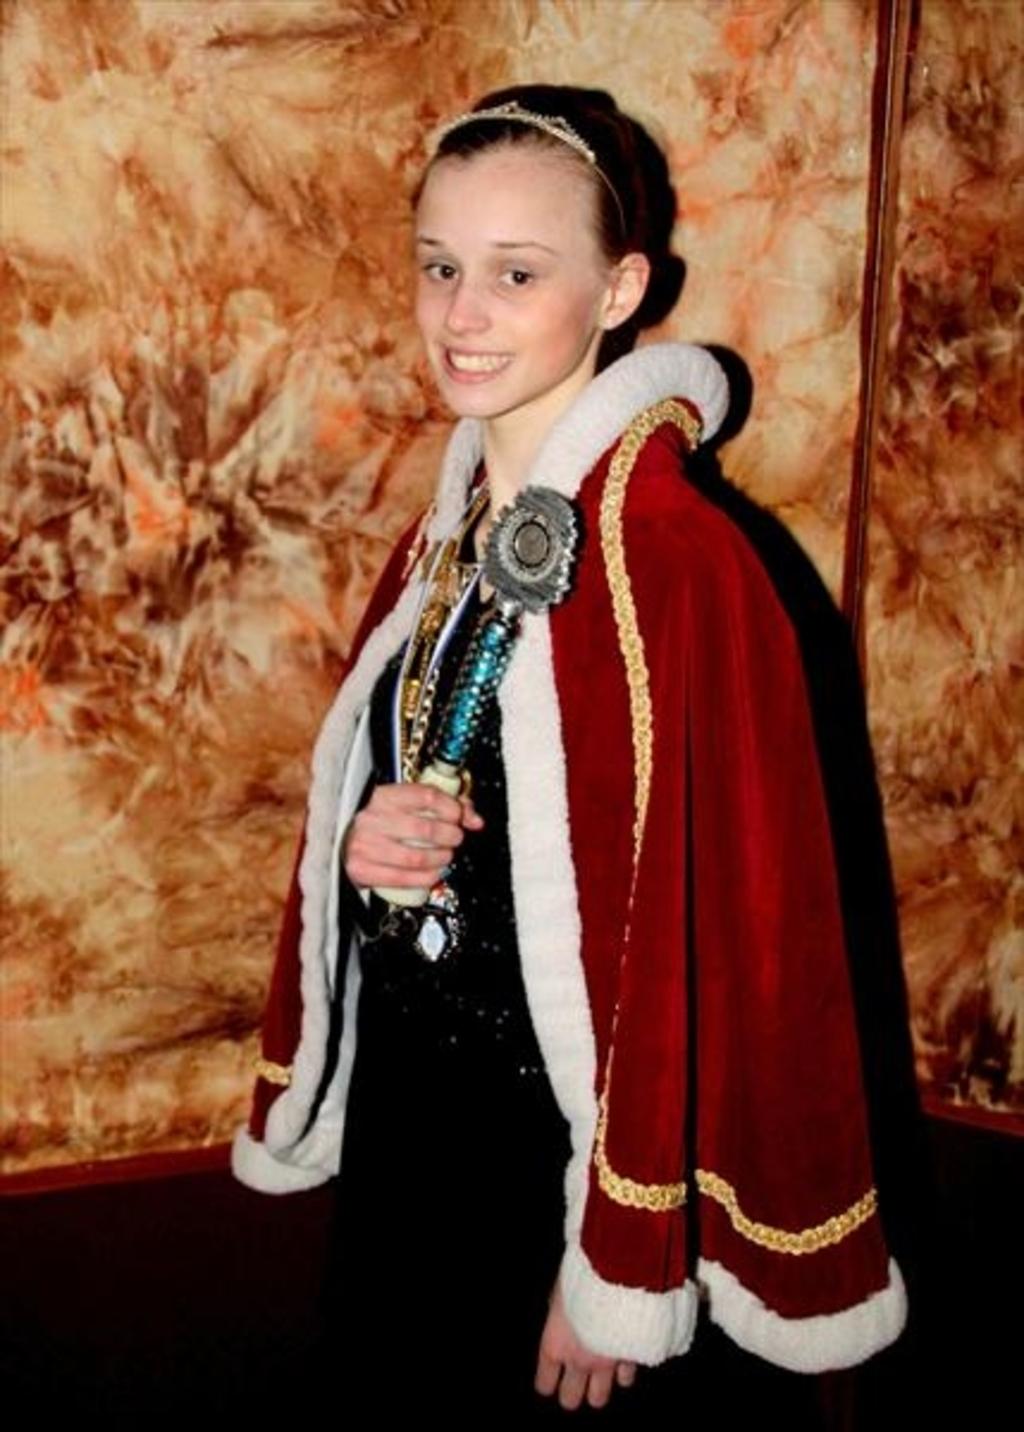 C.V. De Hossende Wevers onthult hun nieuwe Jeugdprinses 2013 Foto:  © mooibernheze